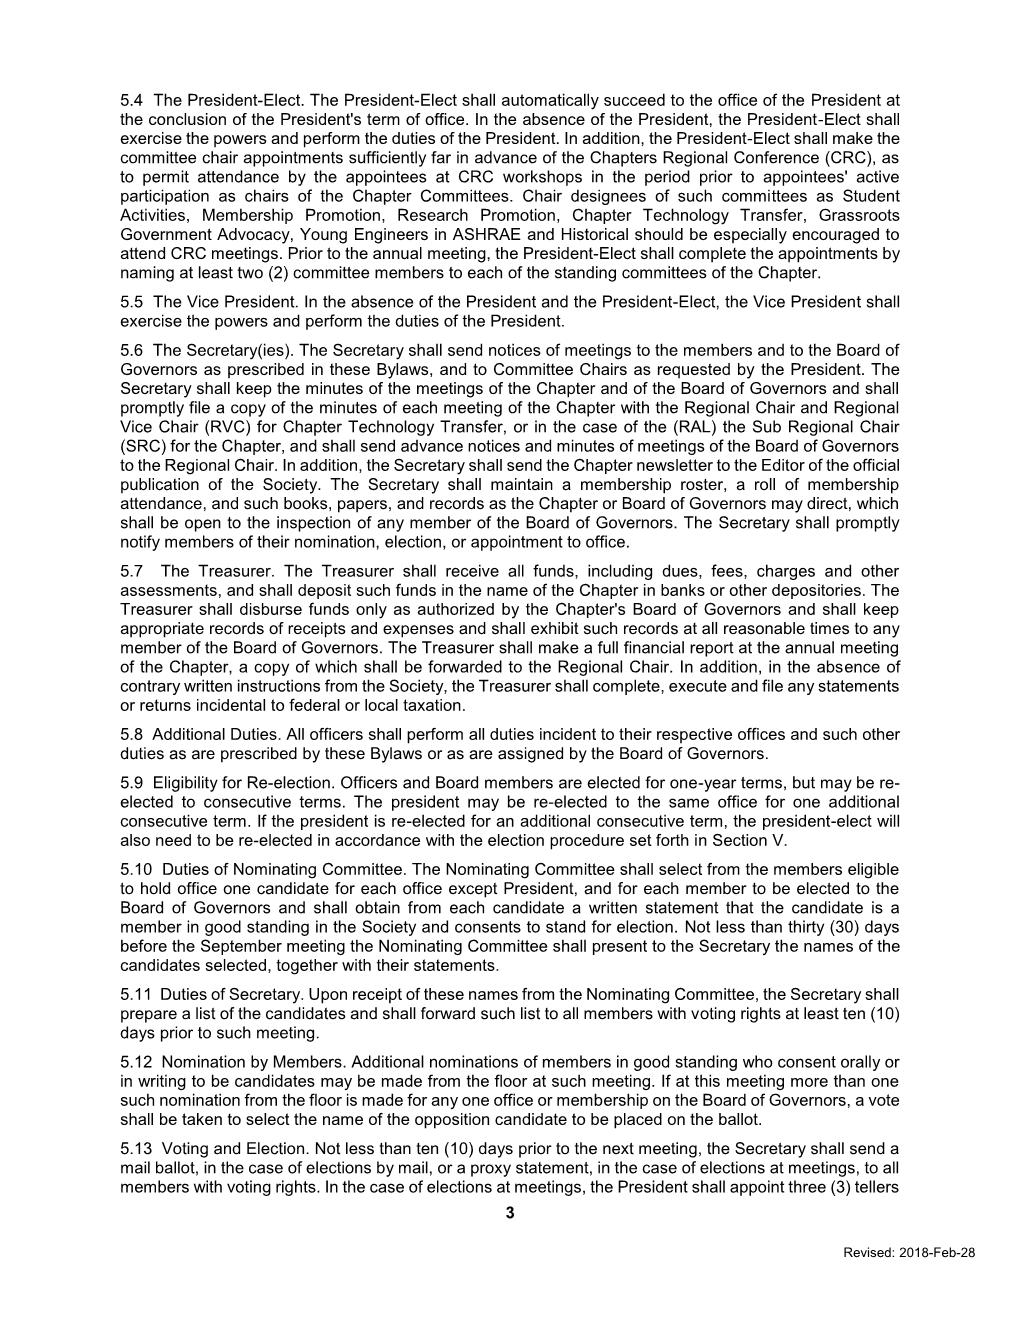 Southern Alberta Chapter CBL Page 003.png